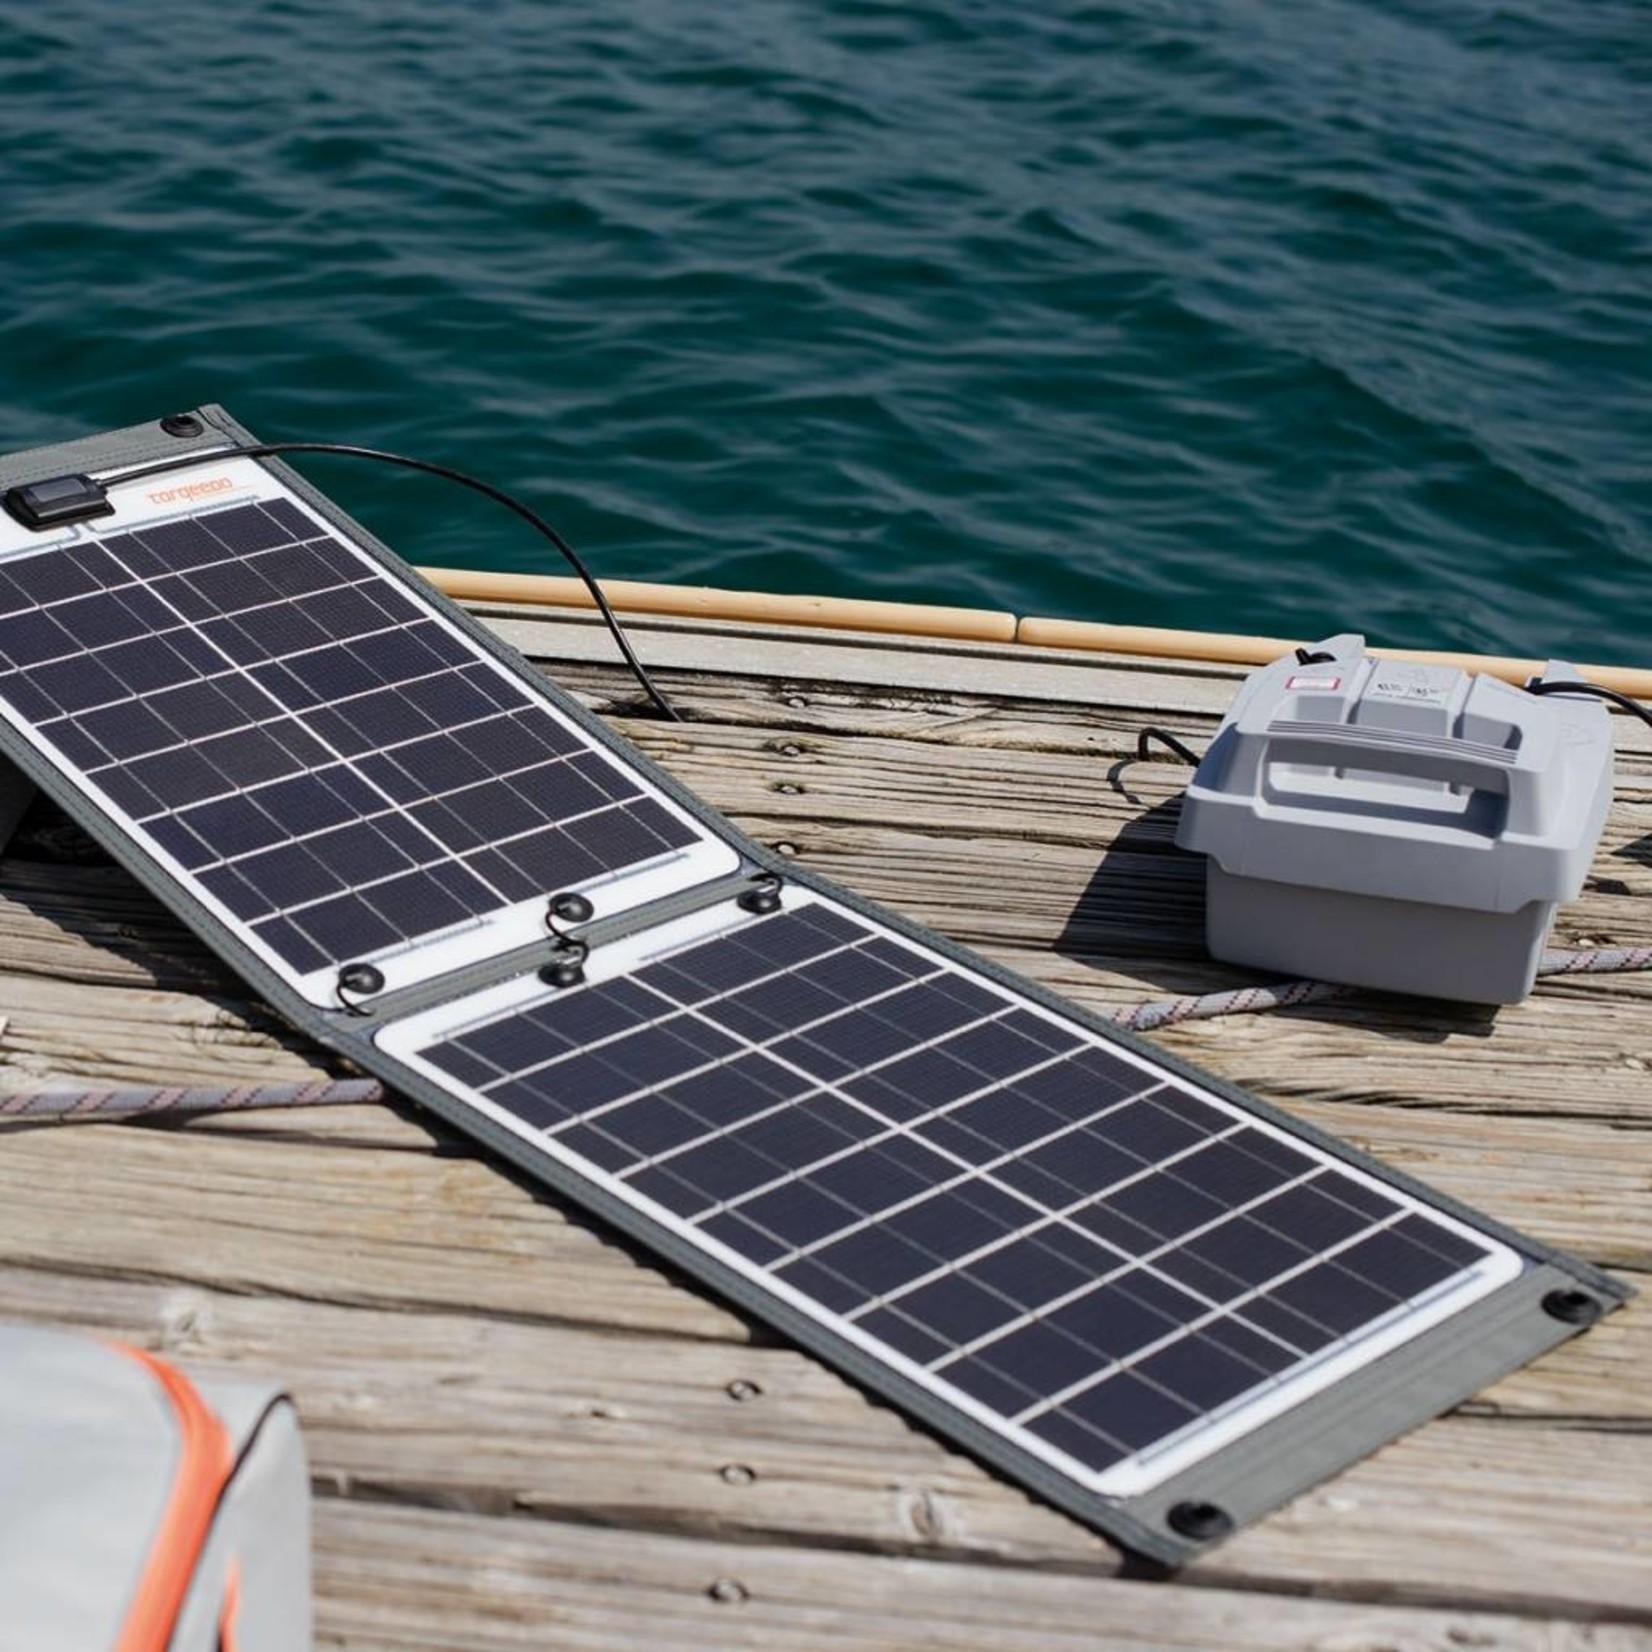 Torqeedo Torqeedo Travel - Ultralight - solar charger Sunfold 50